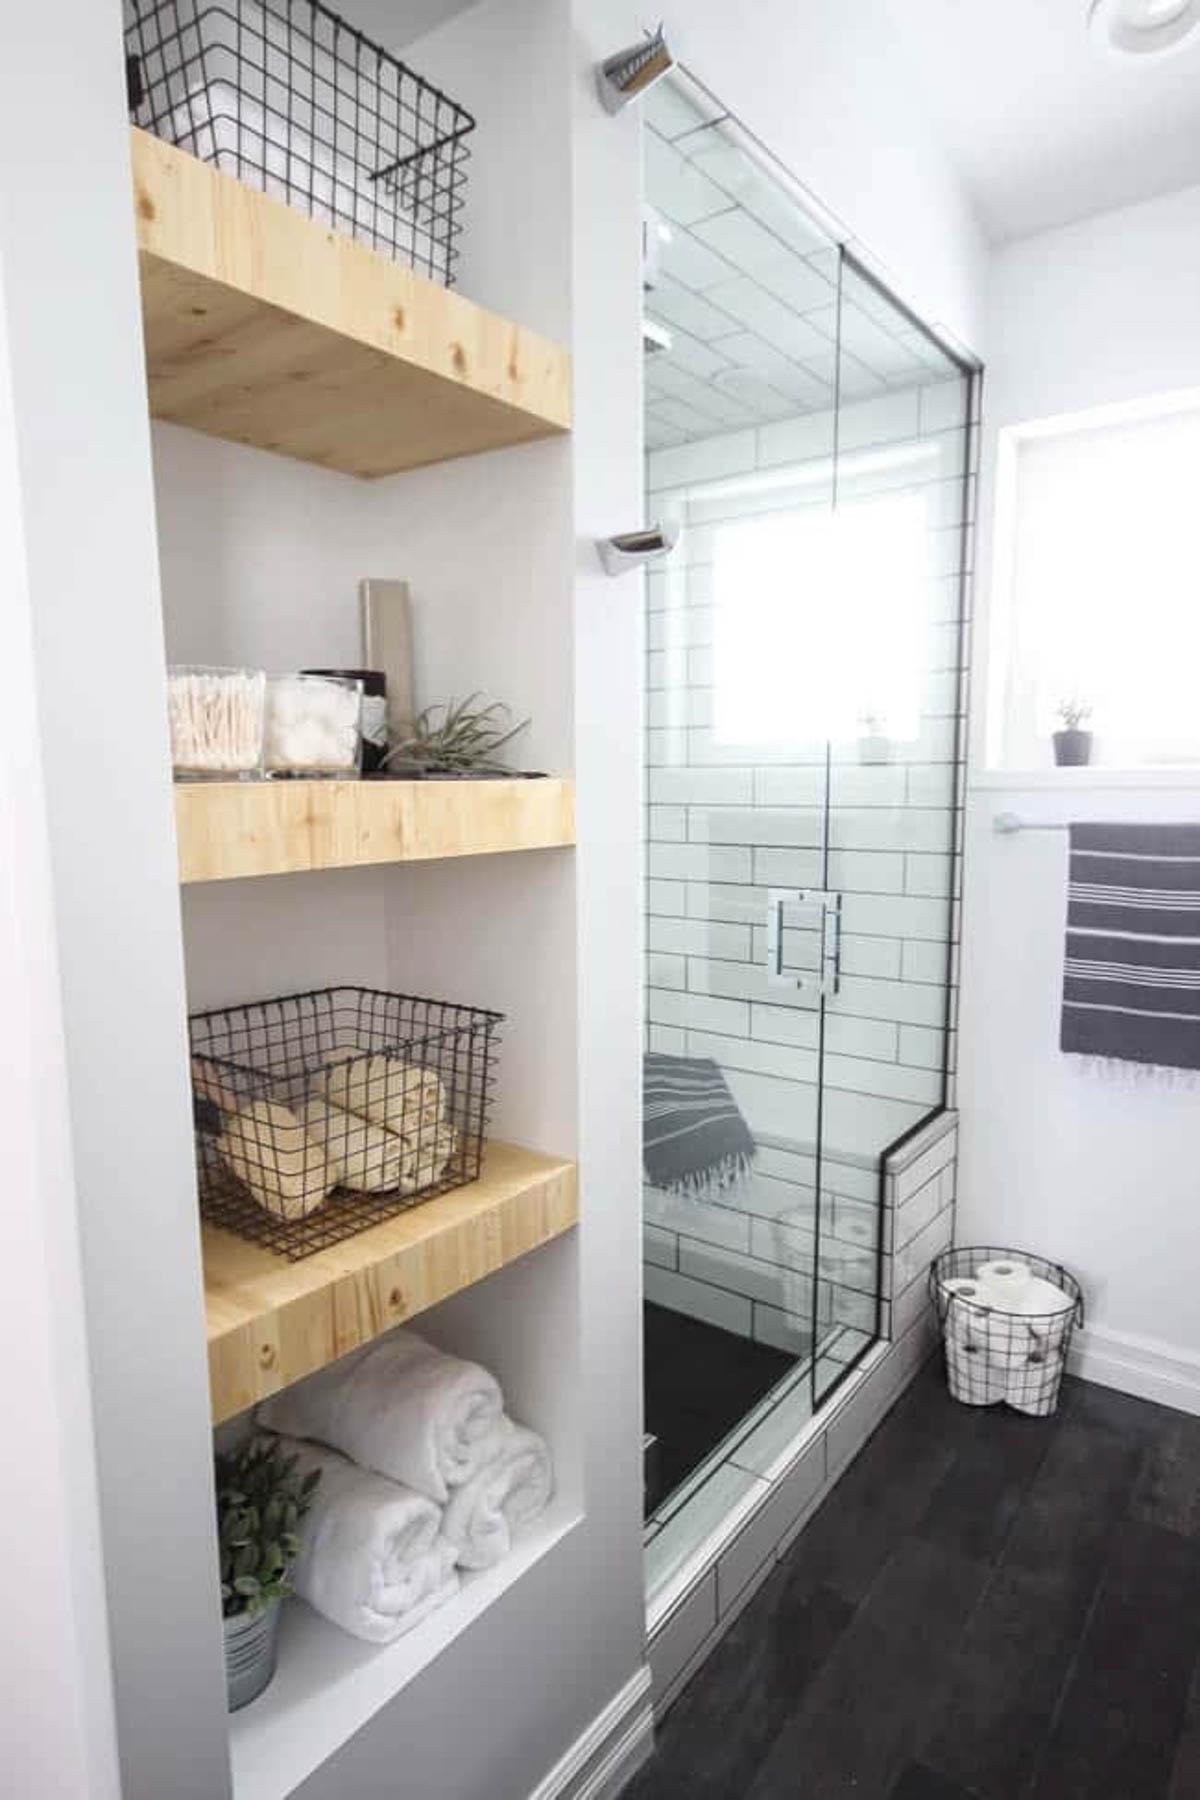 A built-in version of easy floating shelves